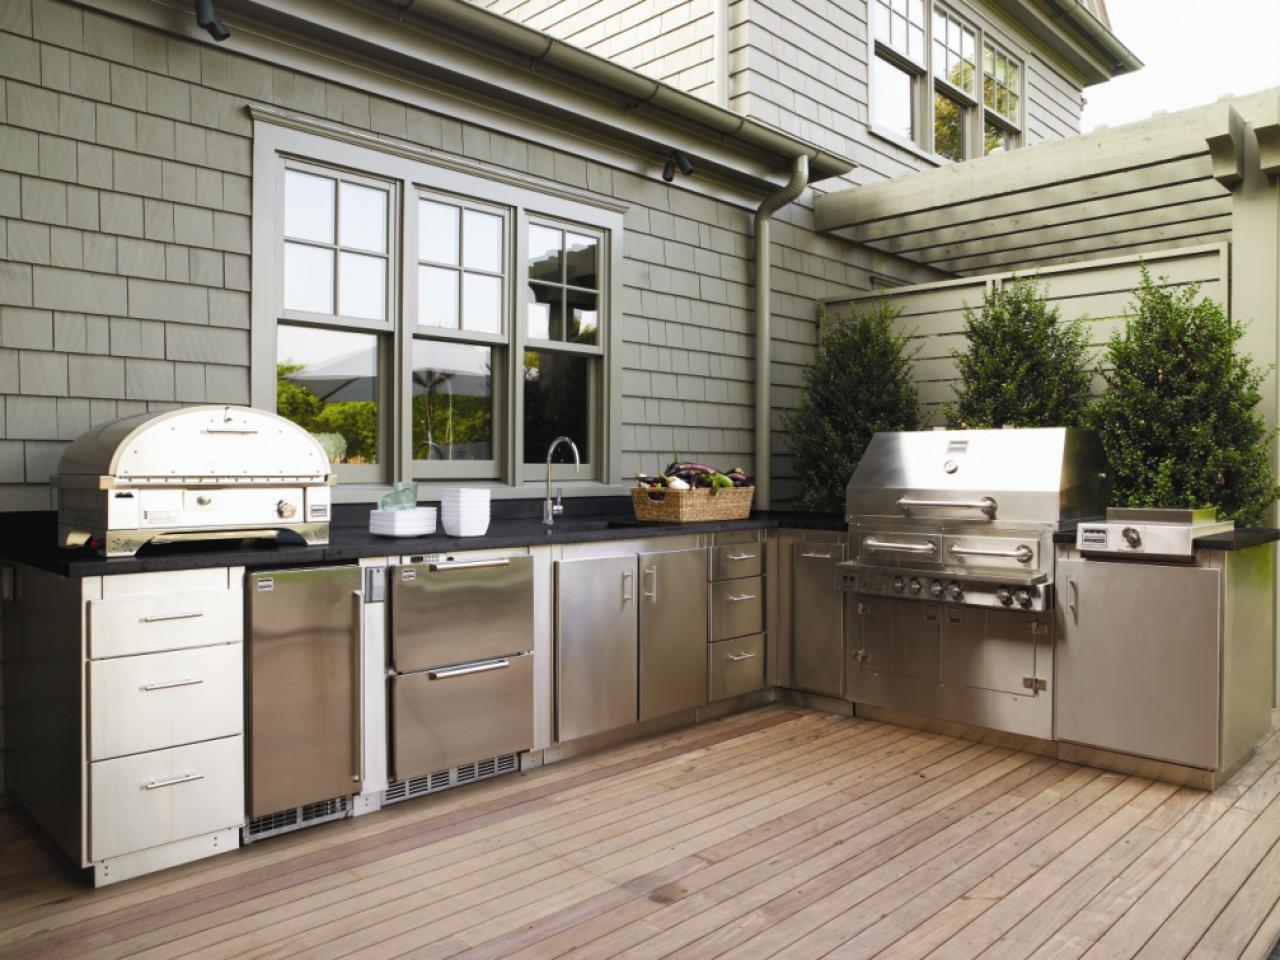 Awesome outdoor braai area designs renov8 construction see solutioingenieria Gallery